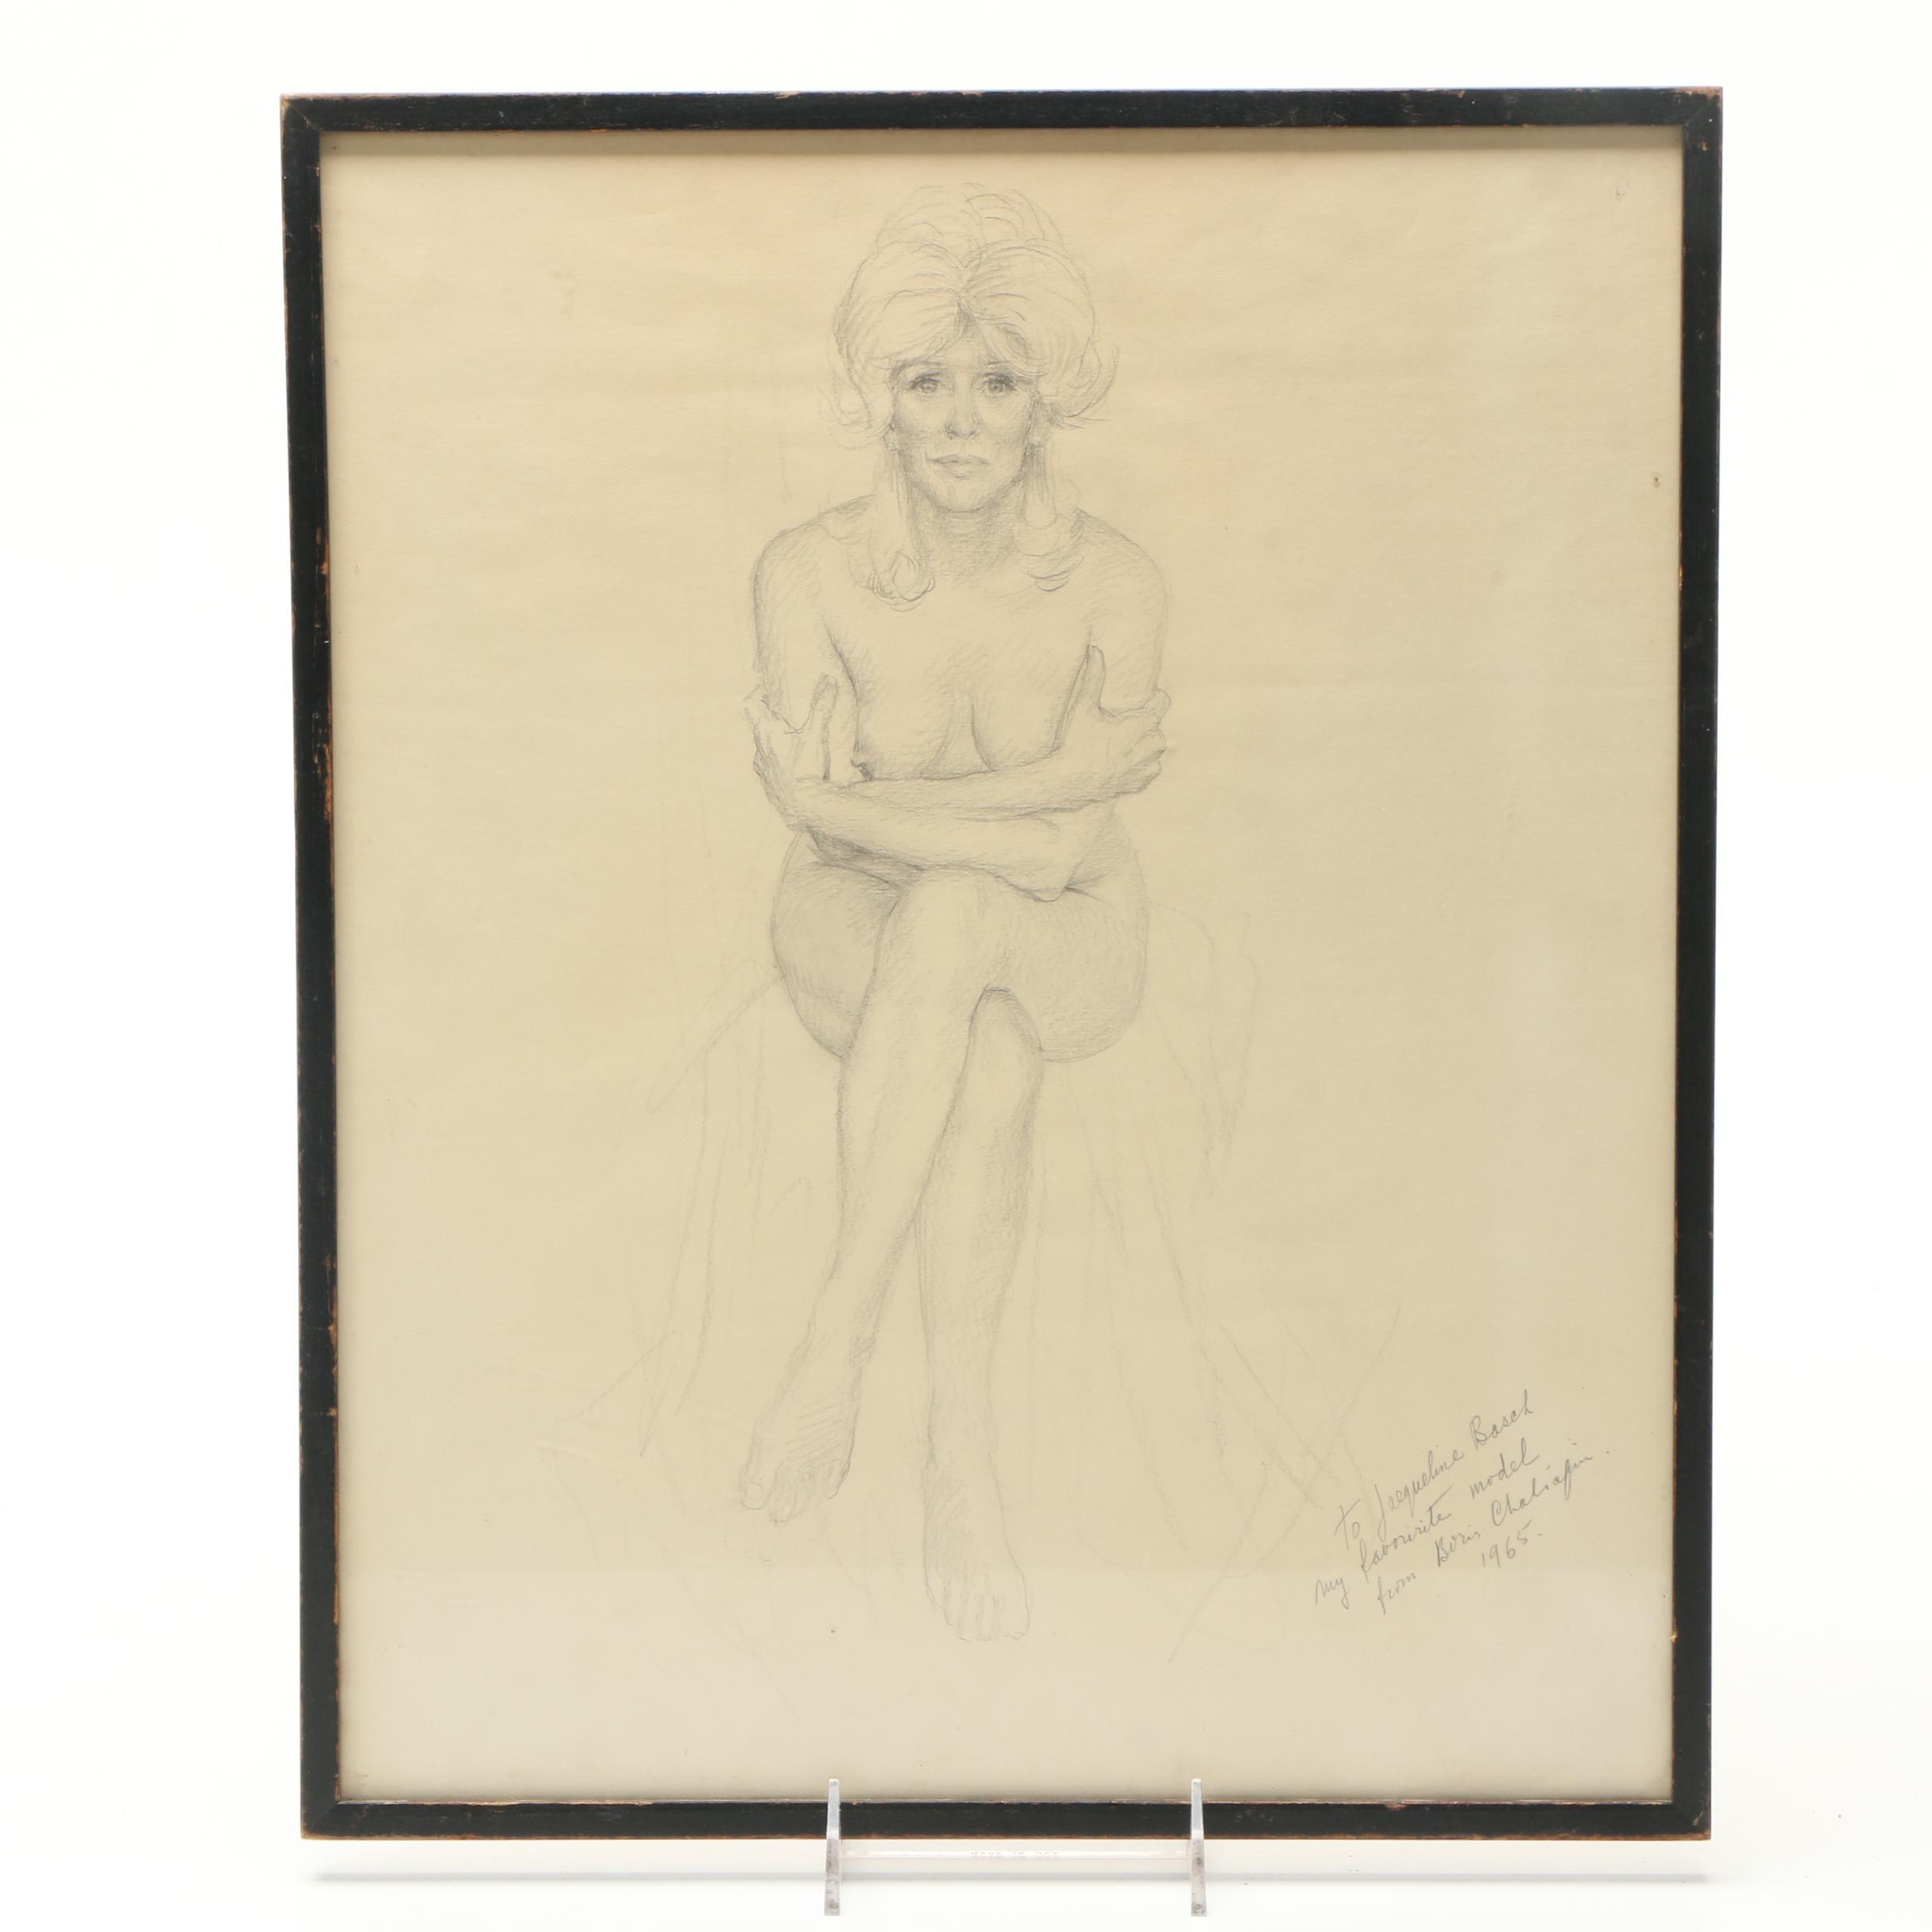 Boris Chaliapin Graphite Drawing of Jacqueline Basch